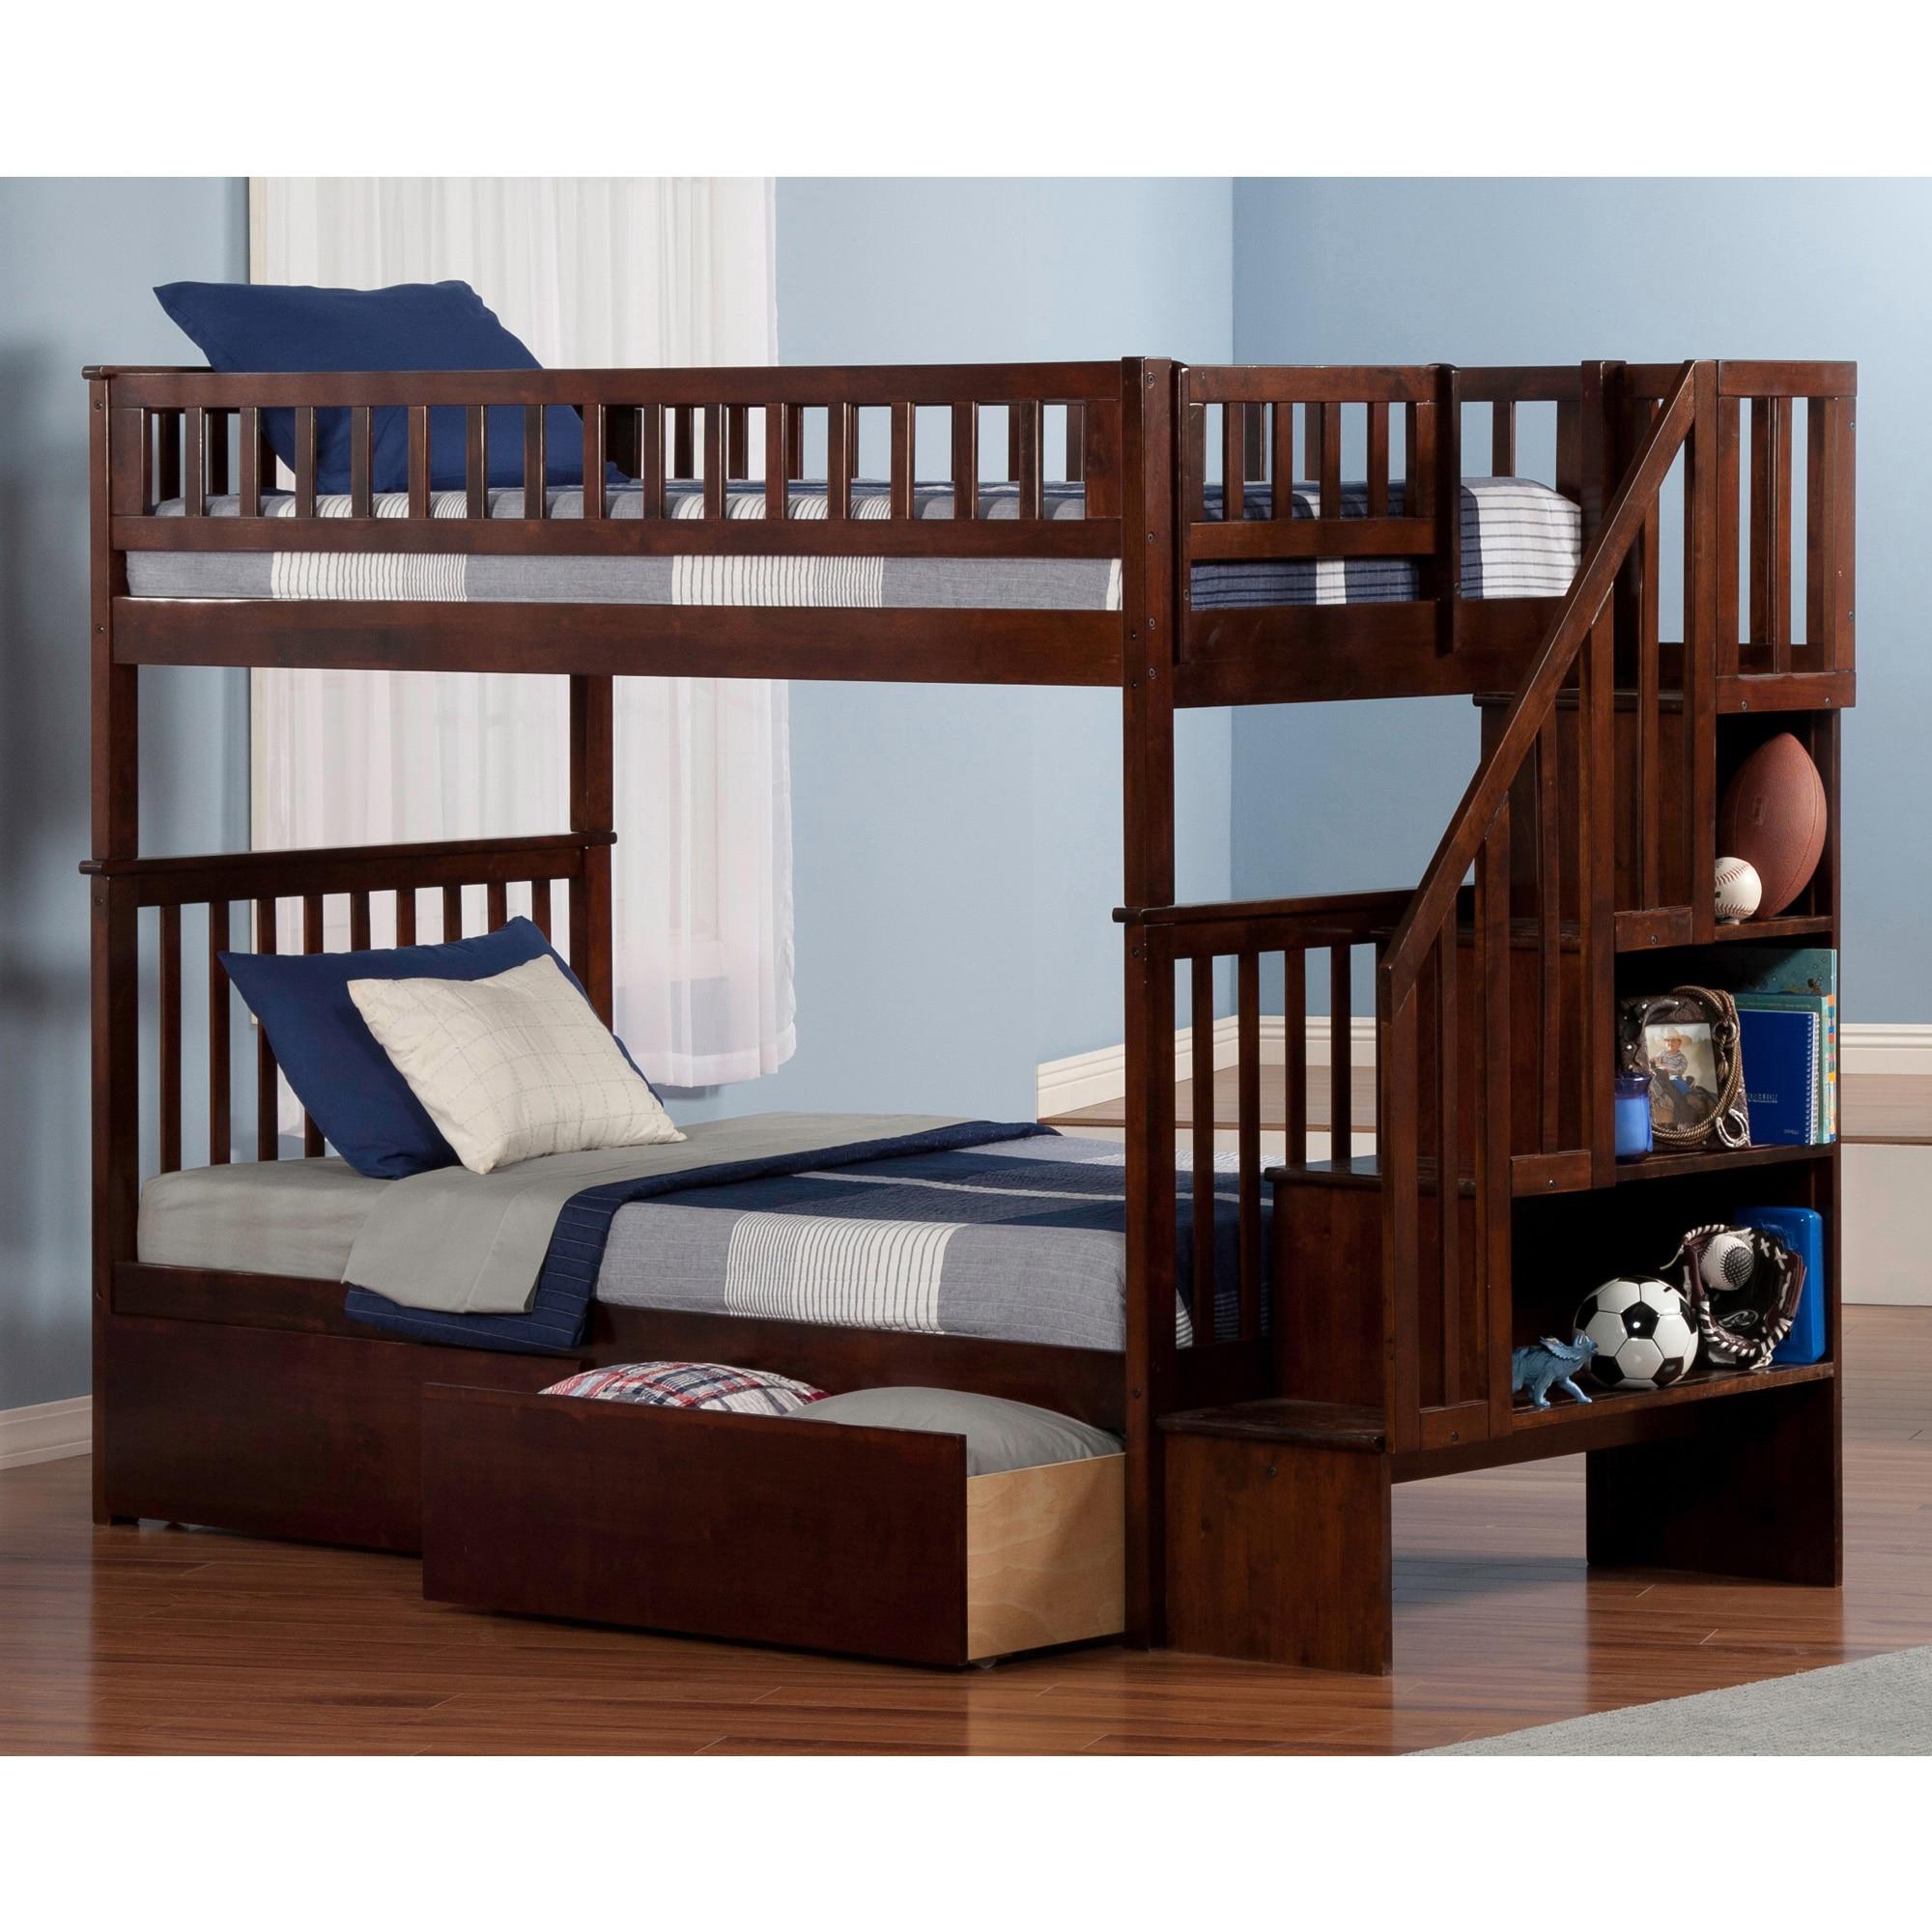 Atlantic Furniture Woodland Walnut Twin-over-twin Stairca...